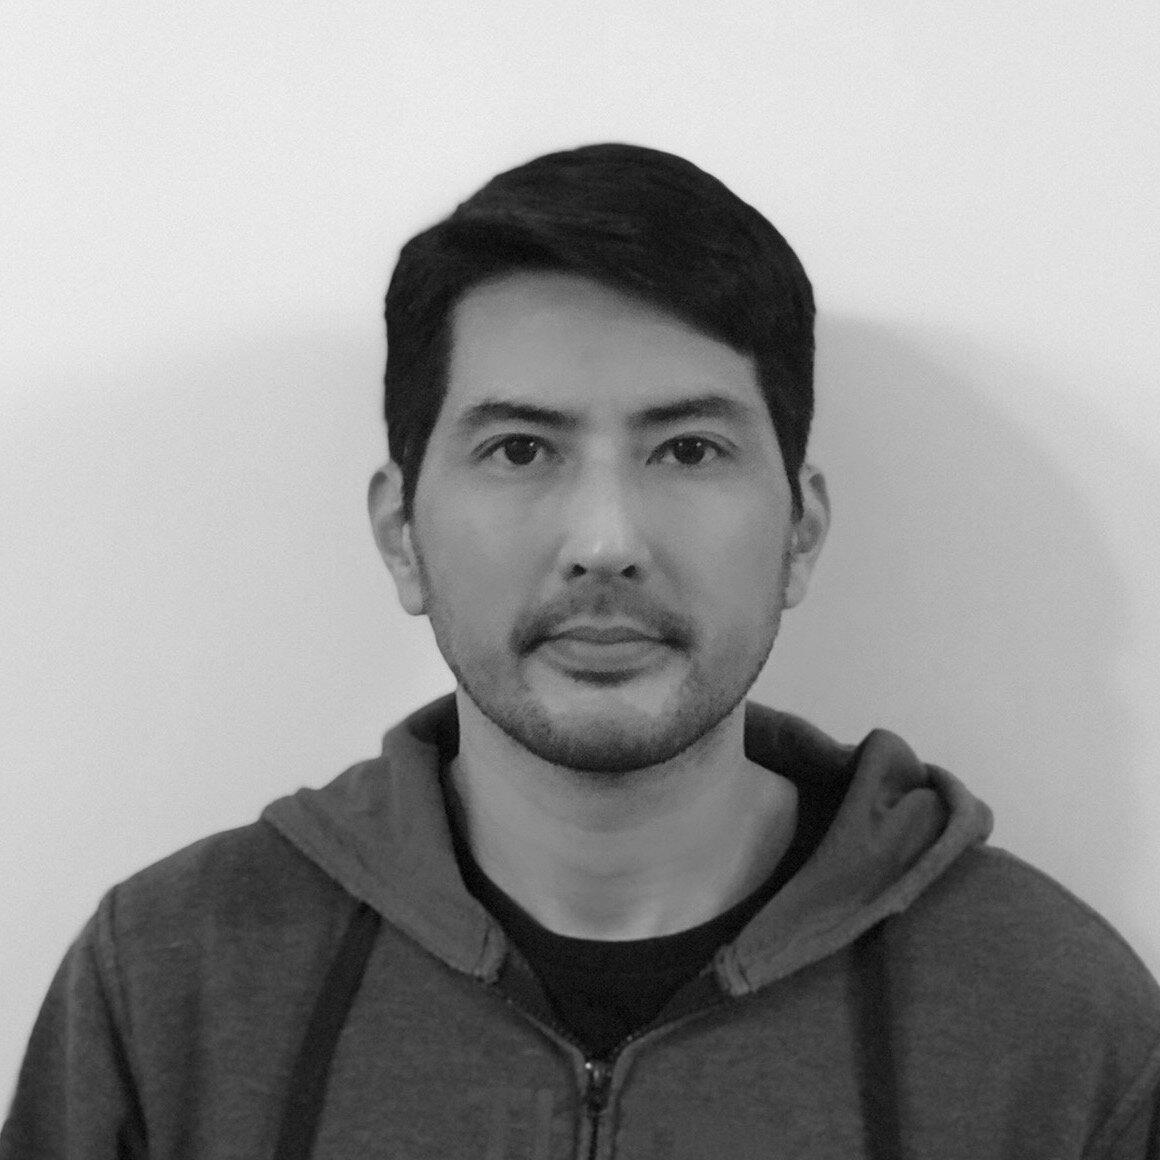 Adrian Inafuku, SDET